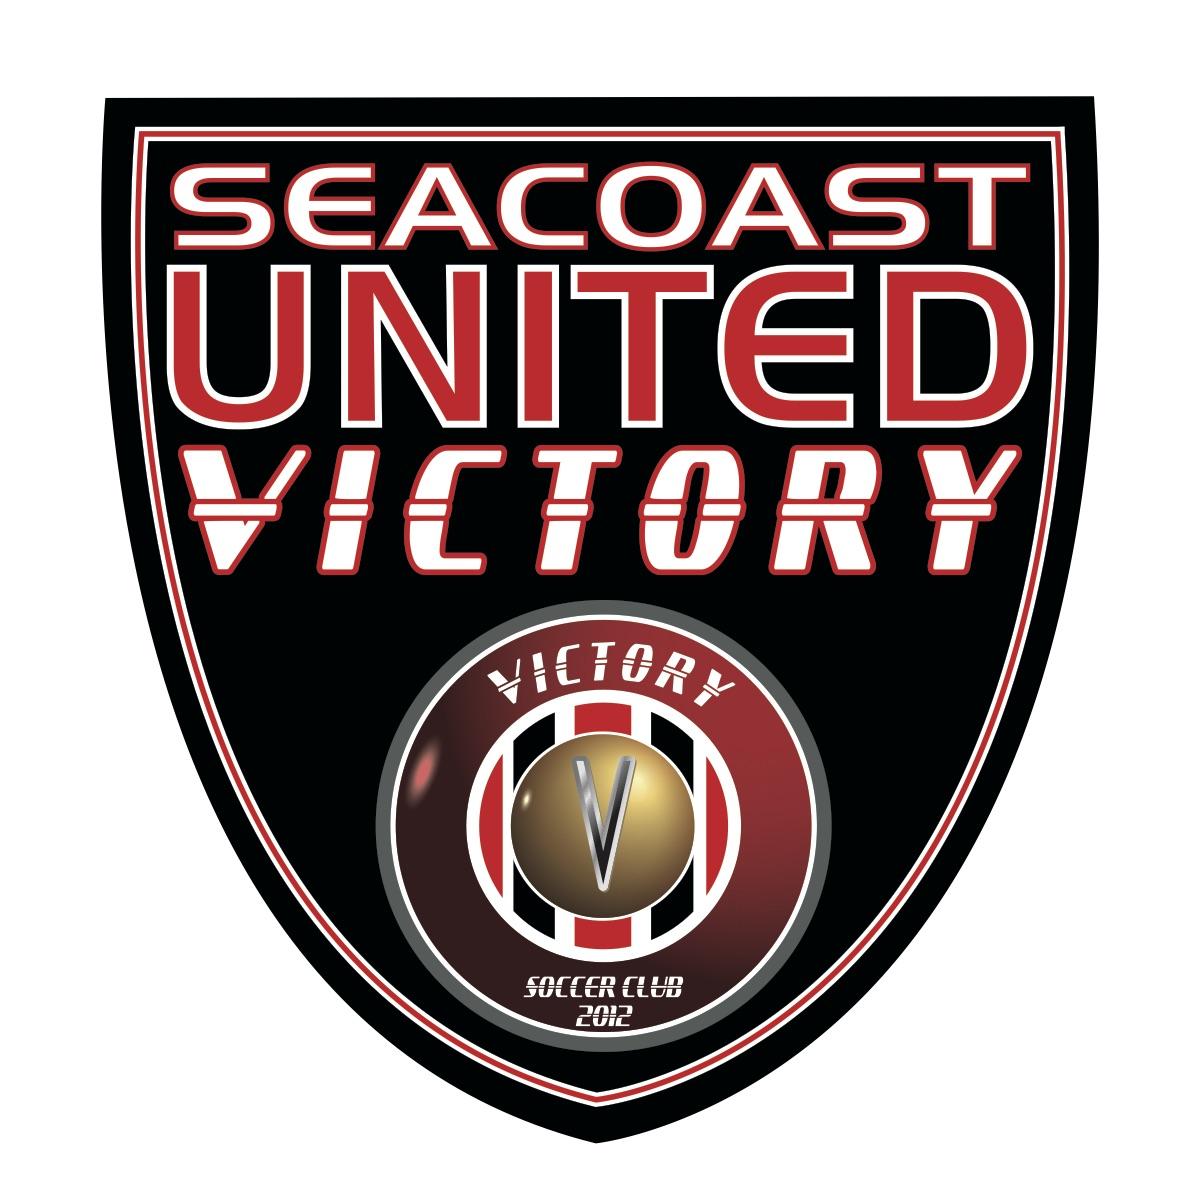 Seacoast United Victory SC